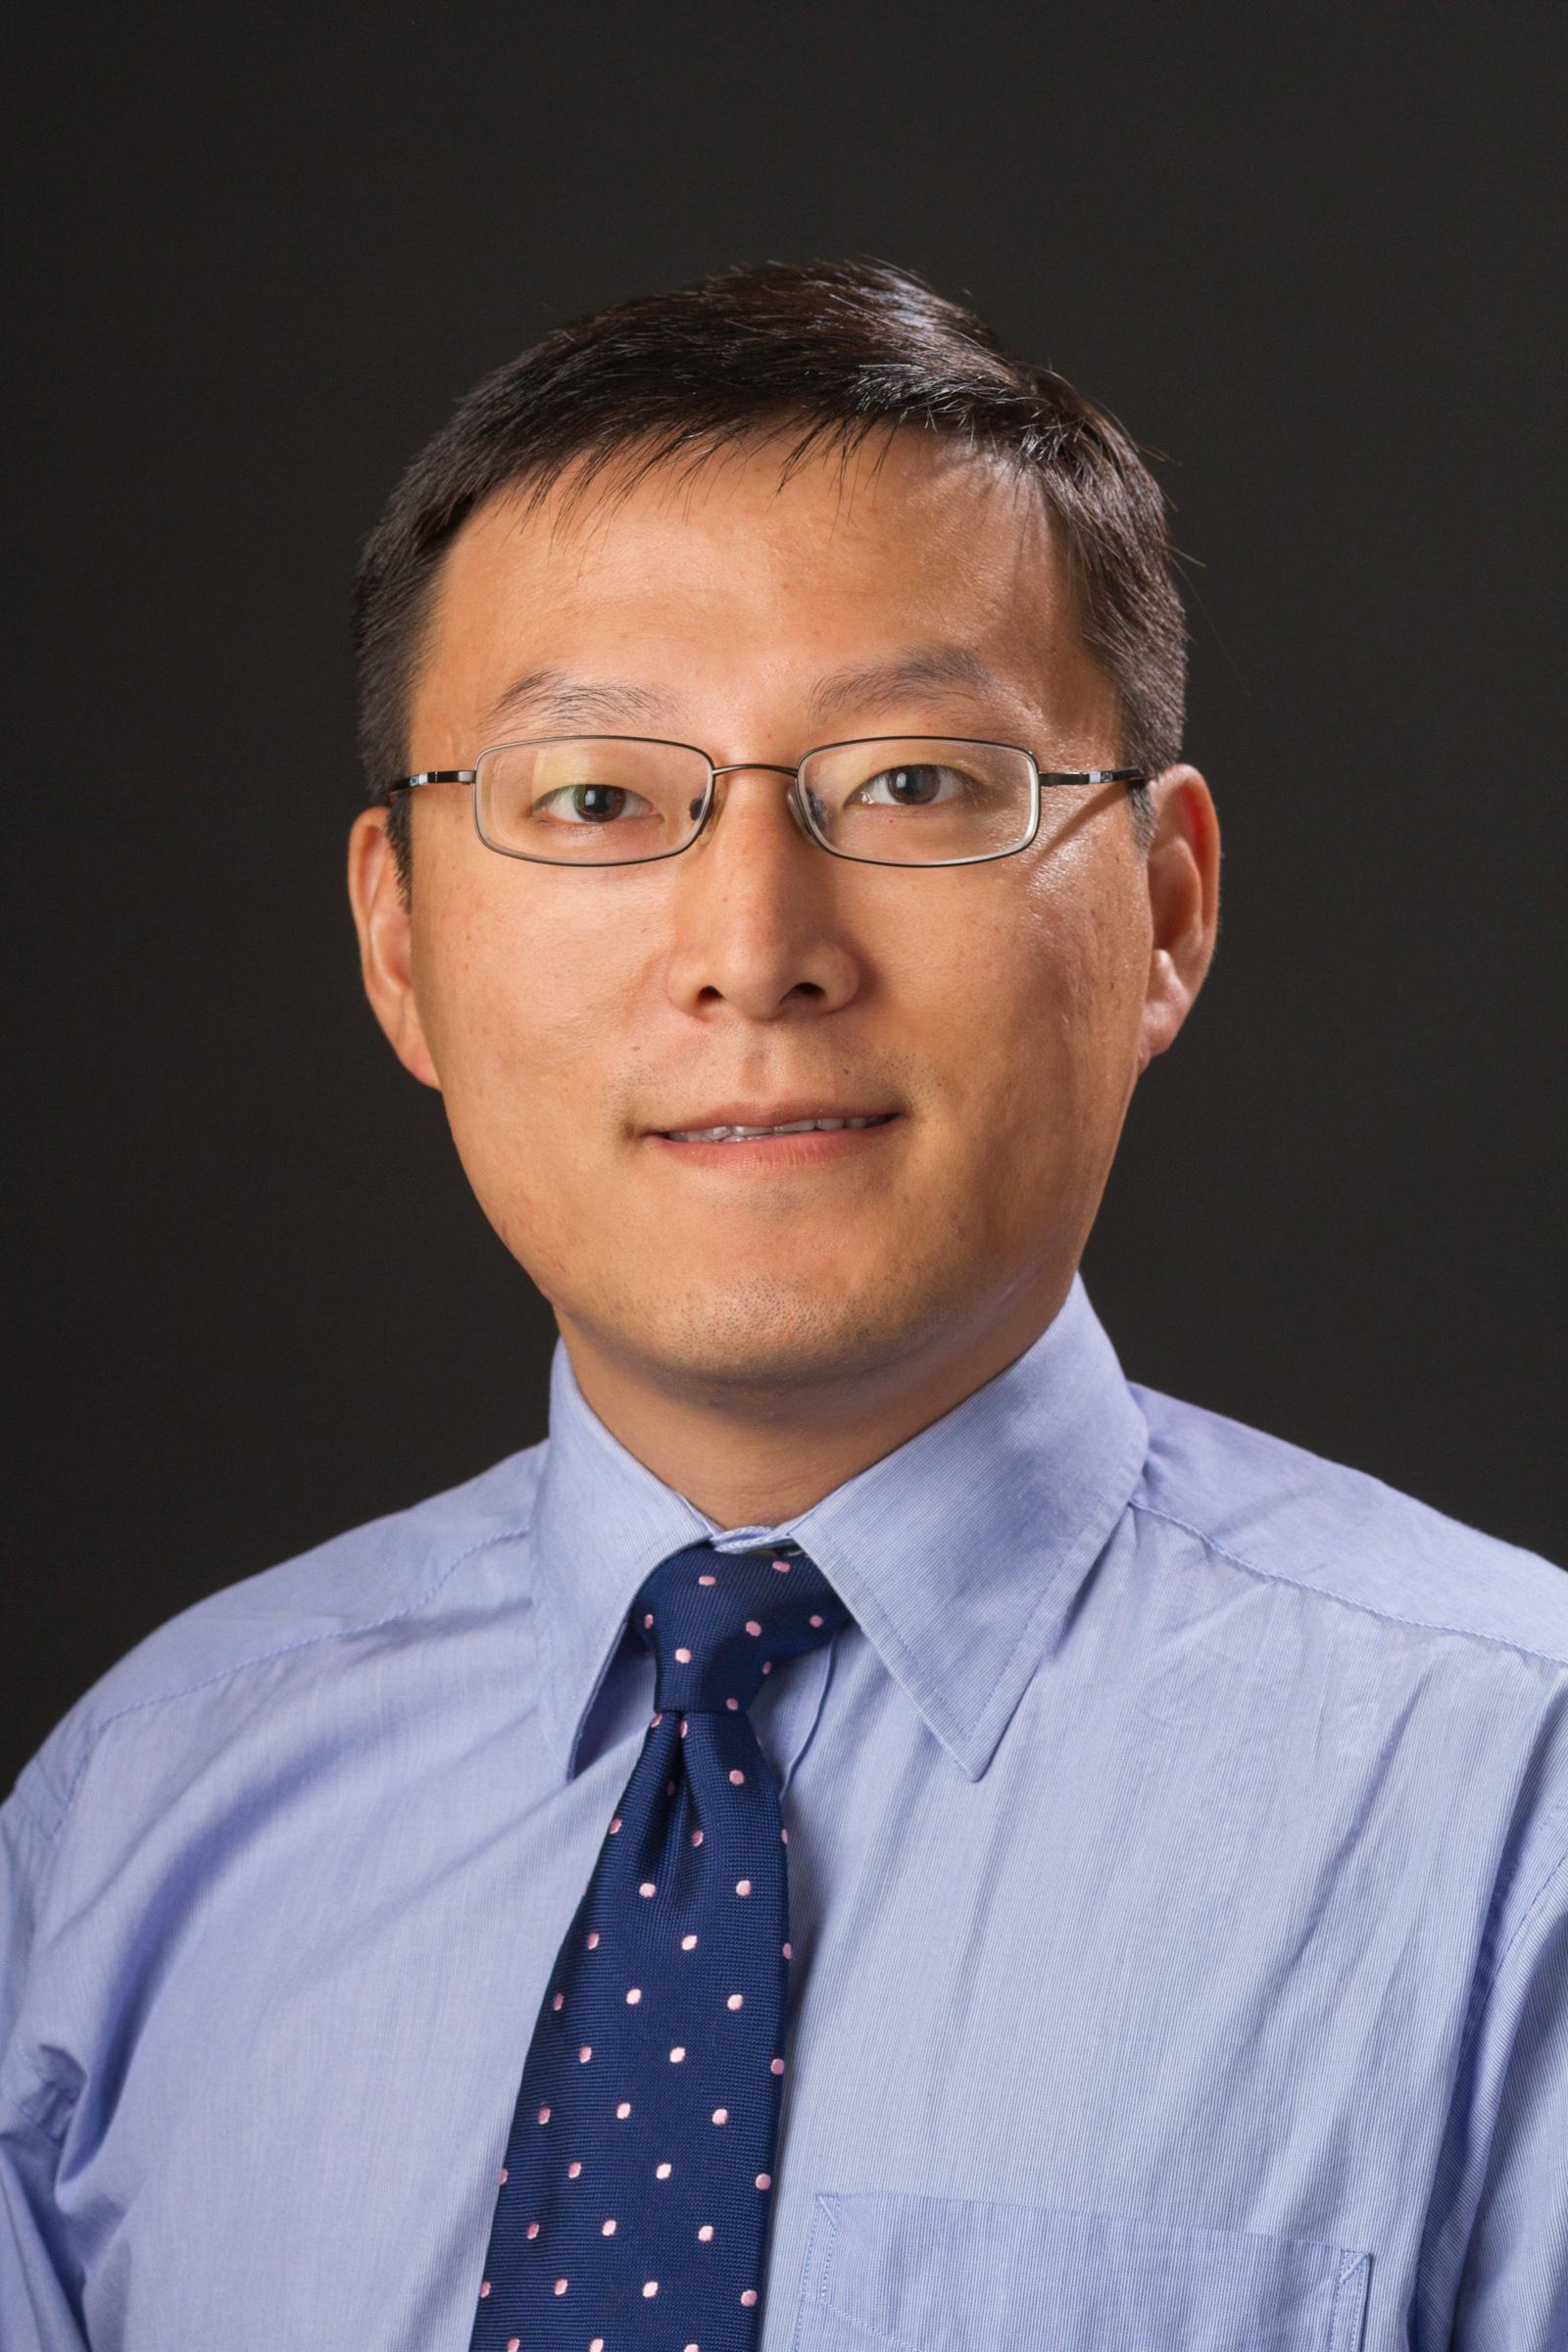 Assistant Professor Xi Chen, Yale School of Public Health